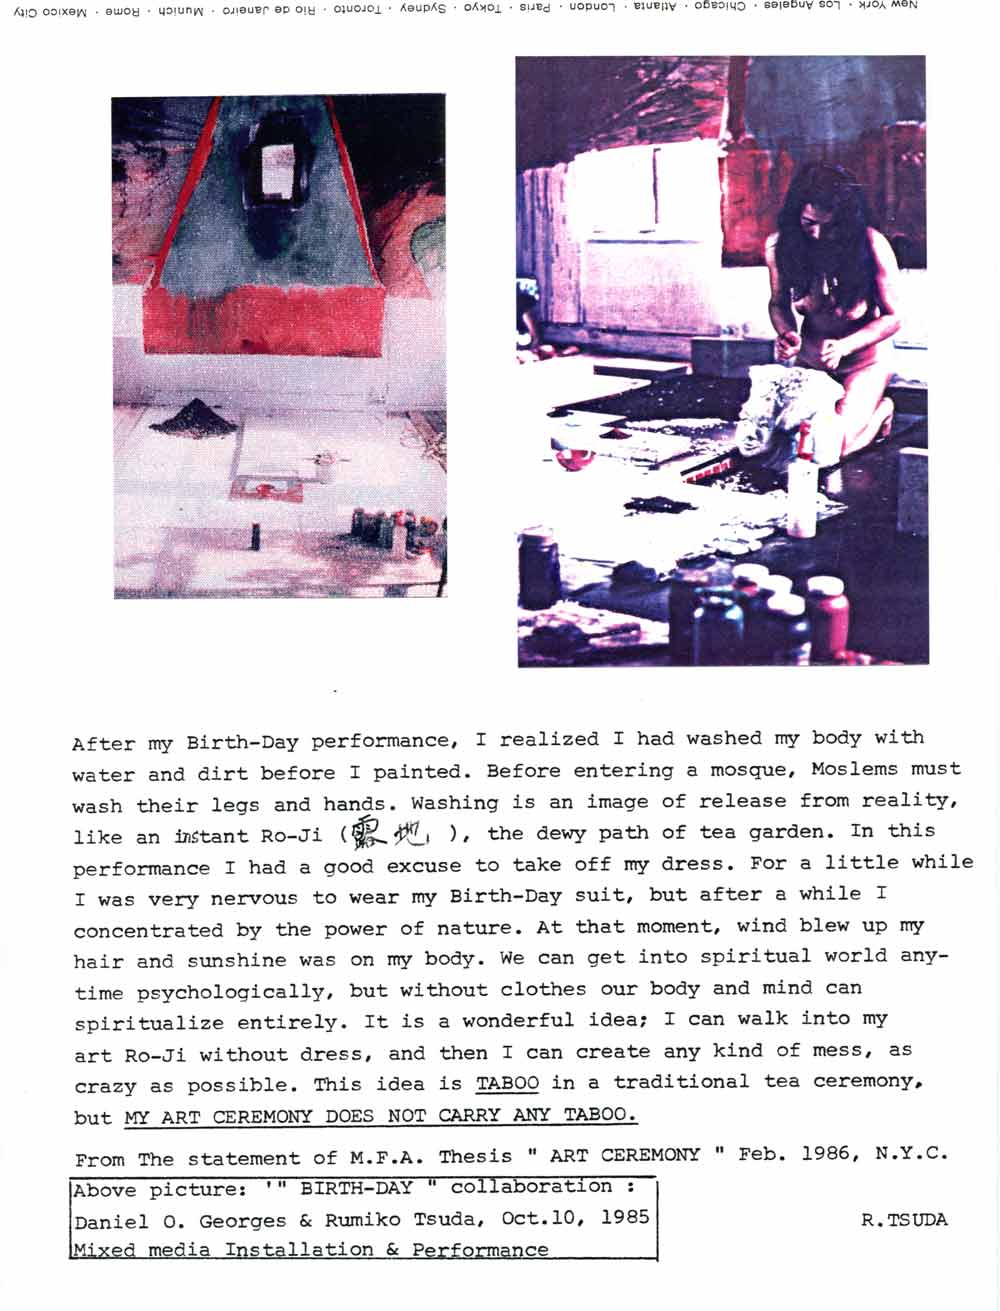 Rumiko Tsuda statements, pg 6